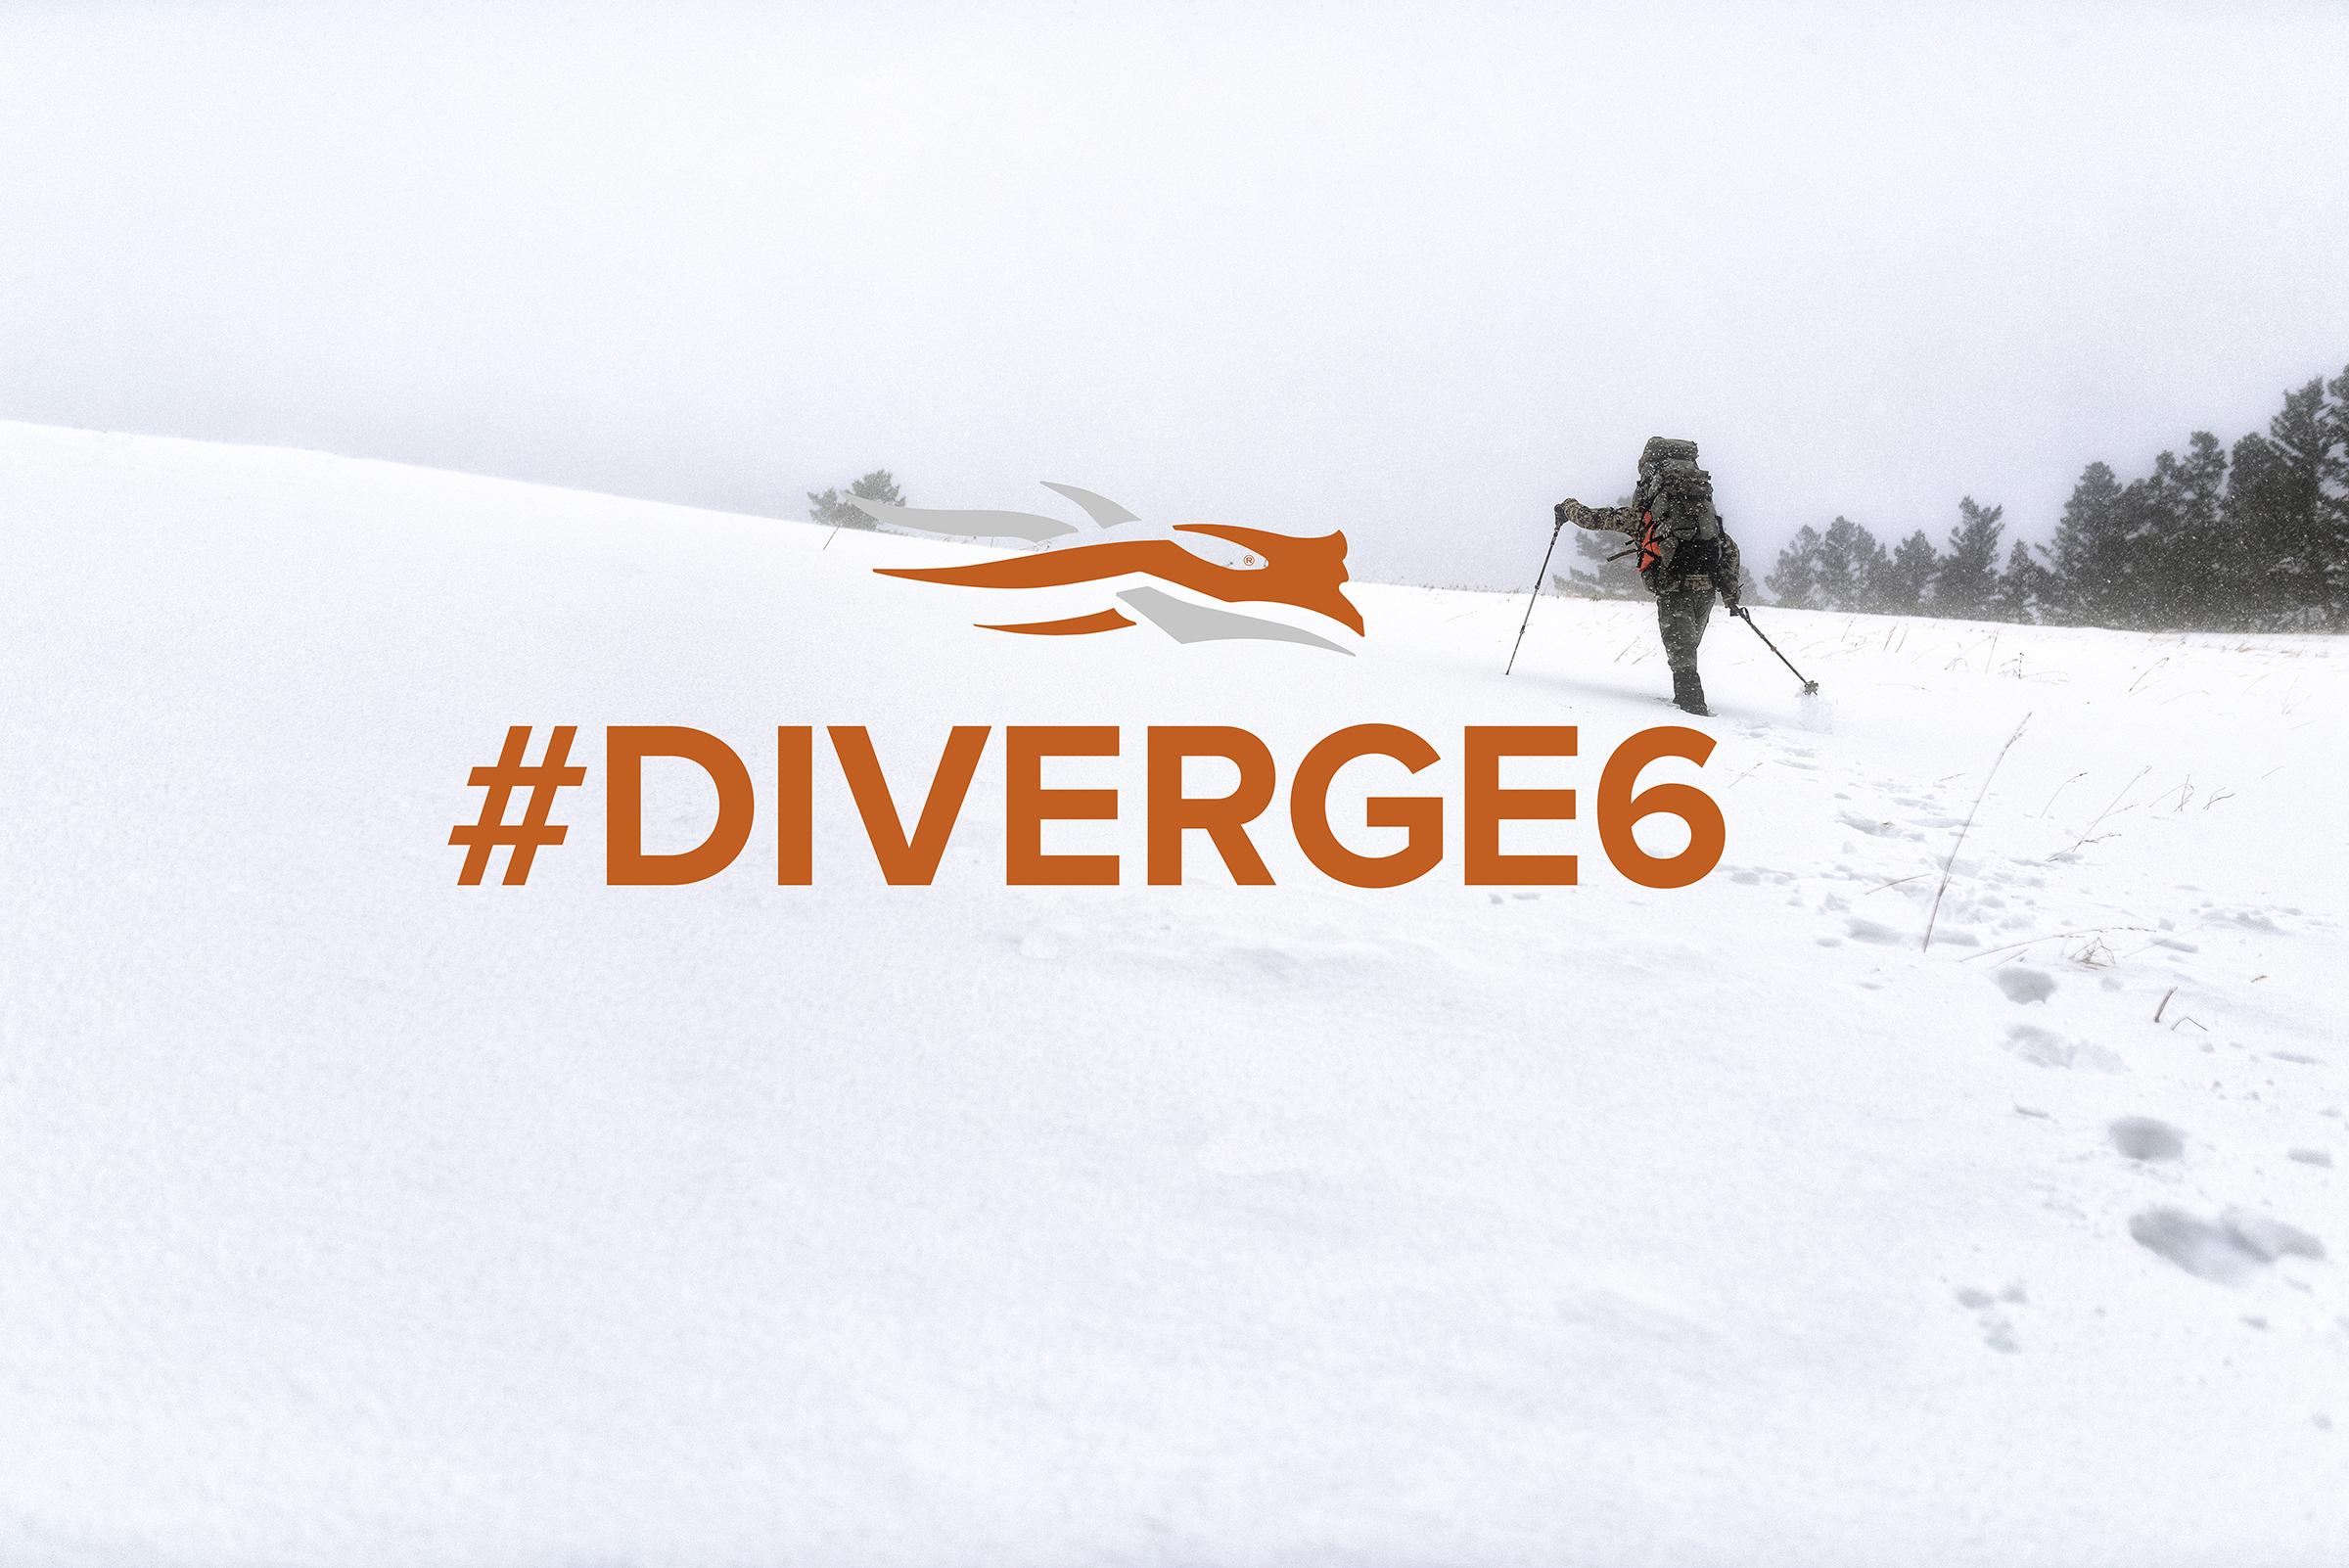 diverge.jpg